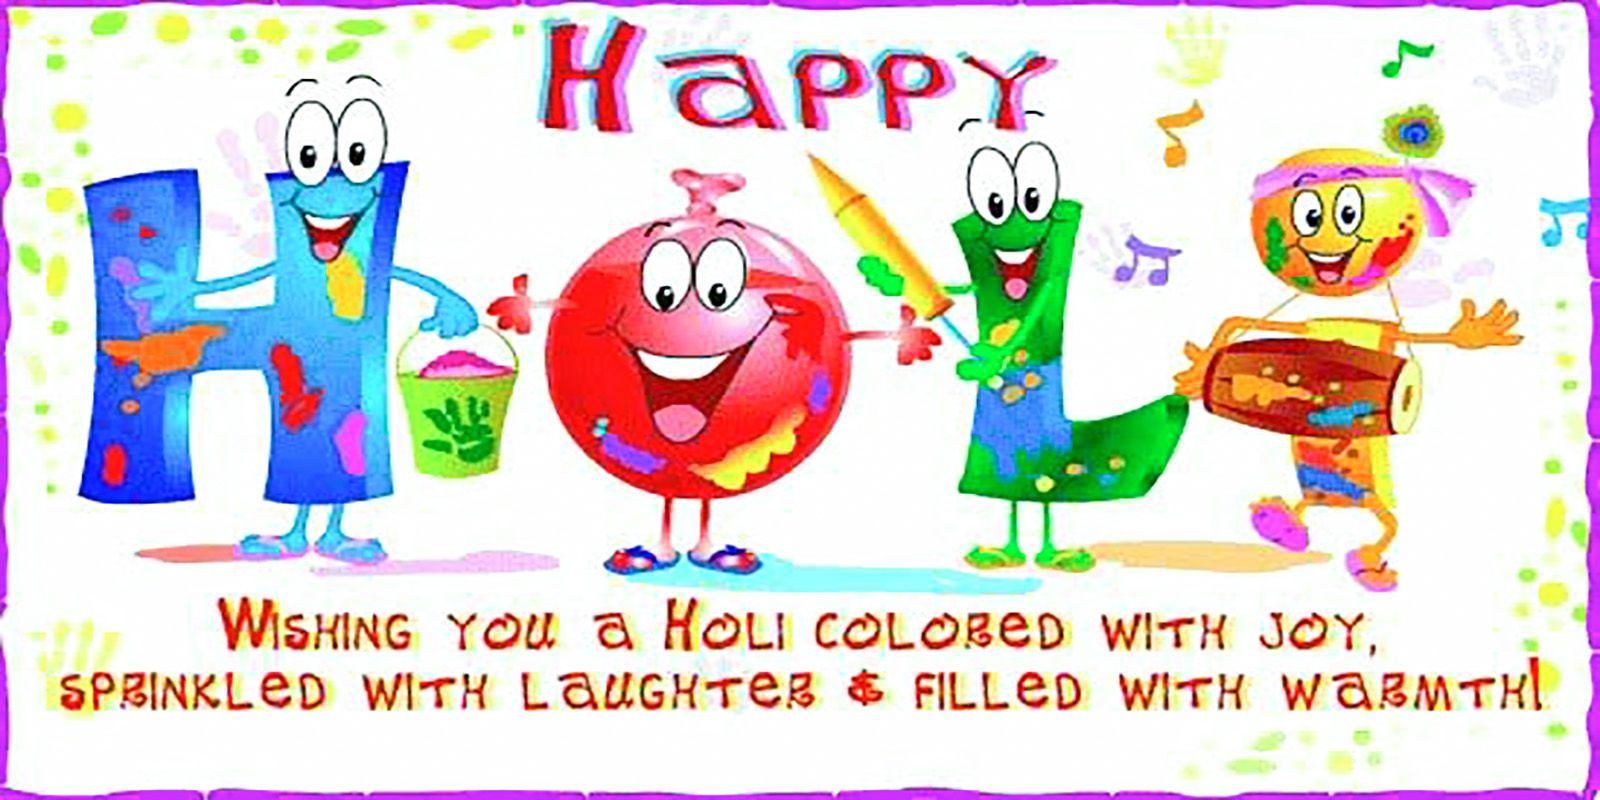 Funny Holi Quotes 2018 (With images) Holi wishes, Happy holi